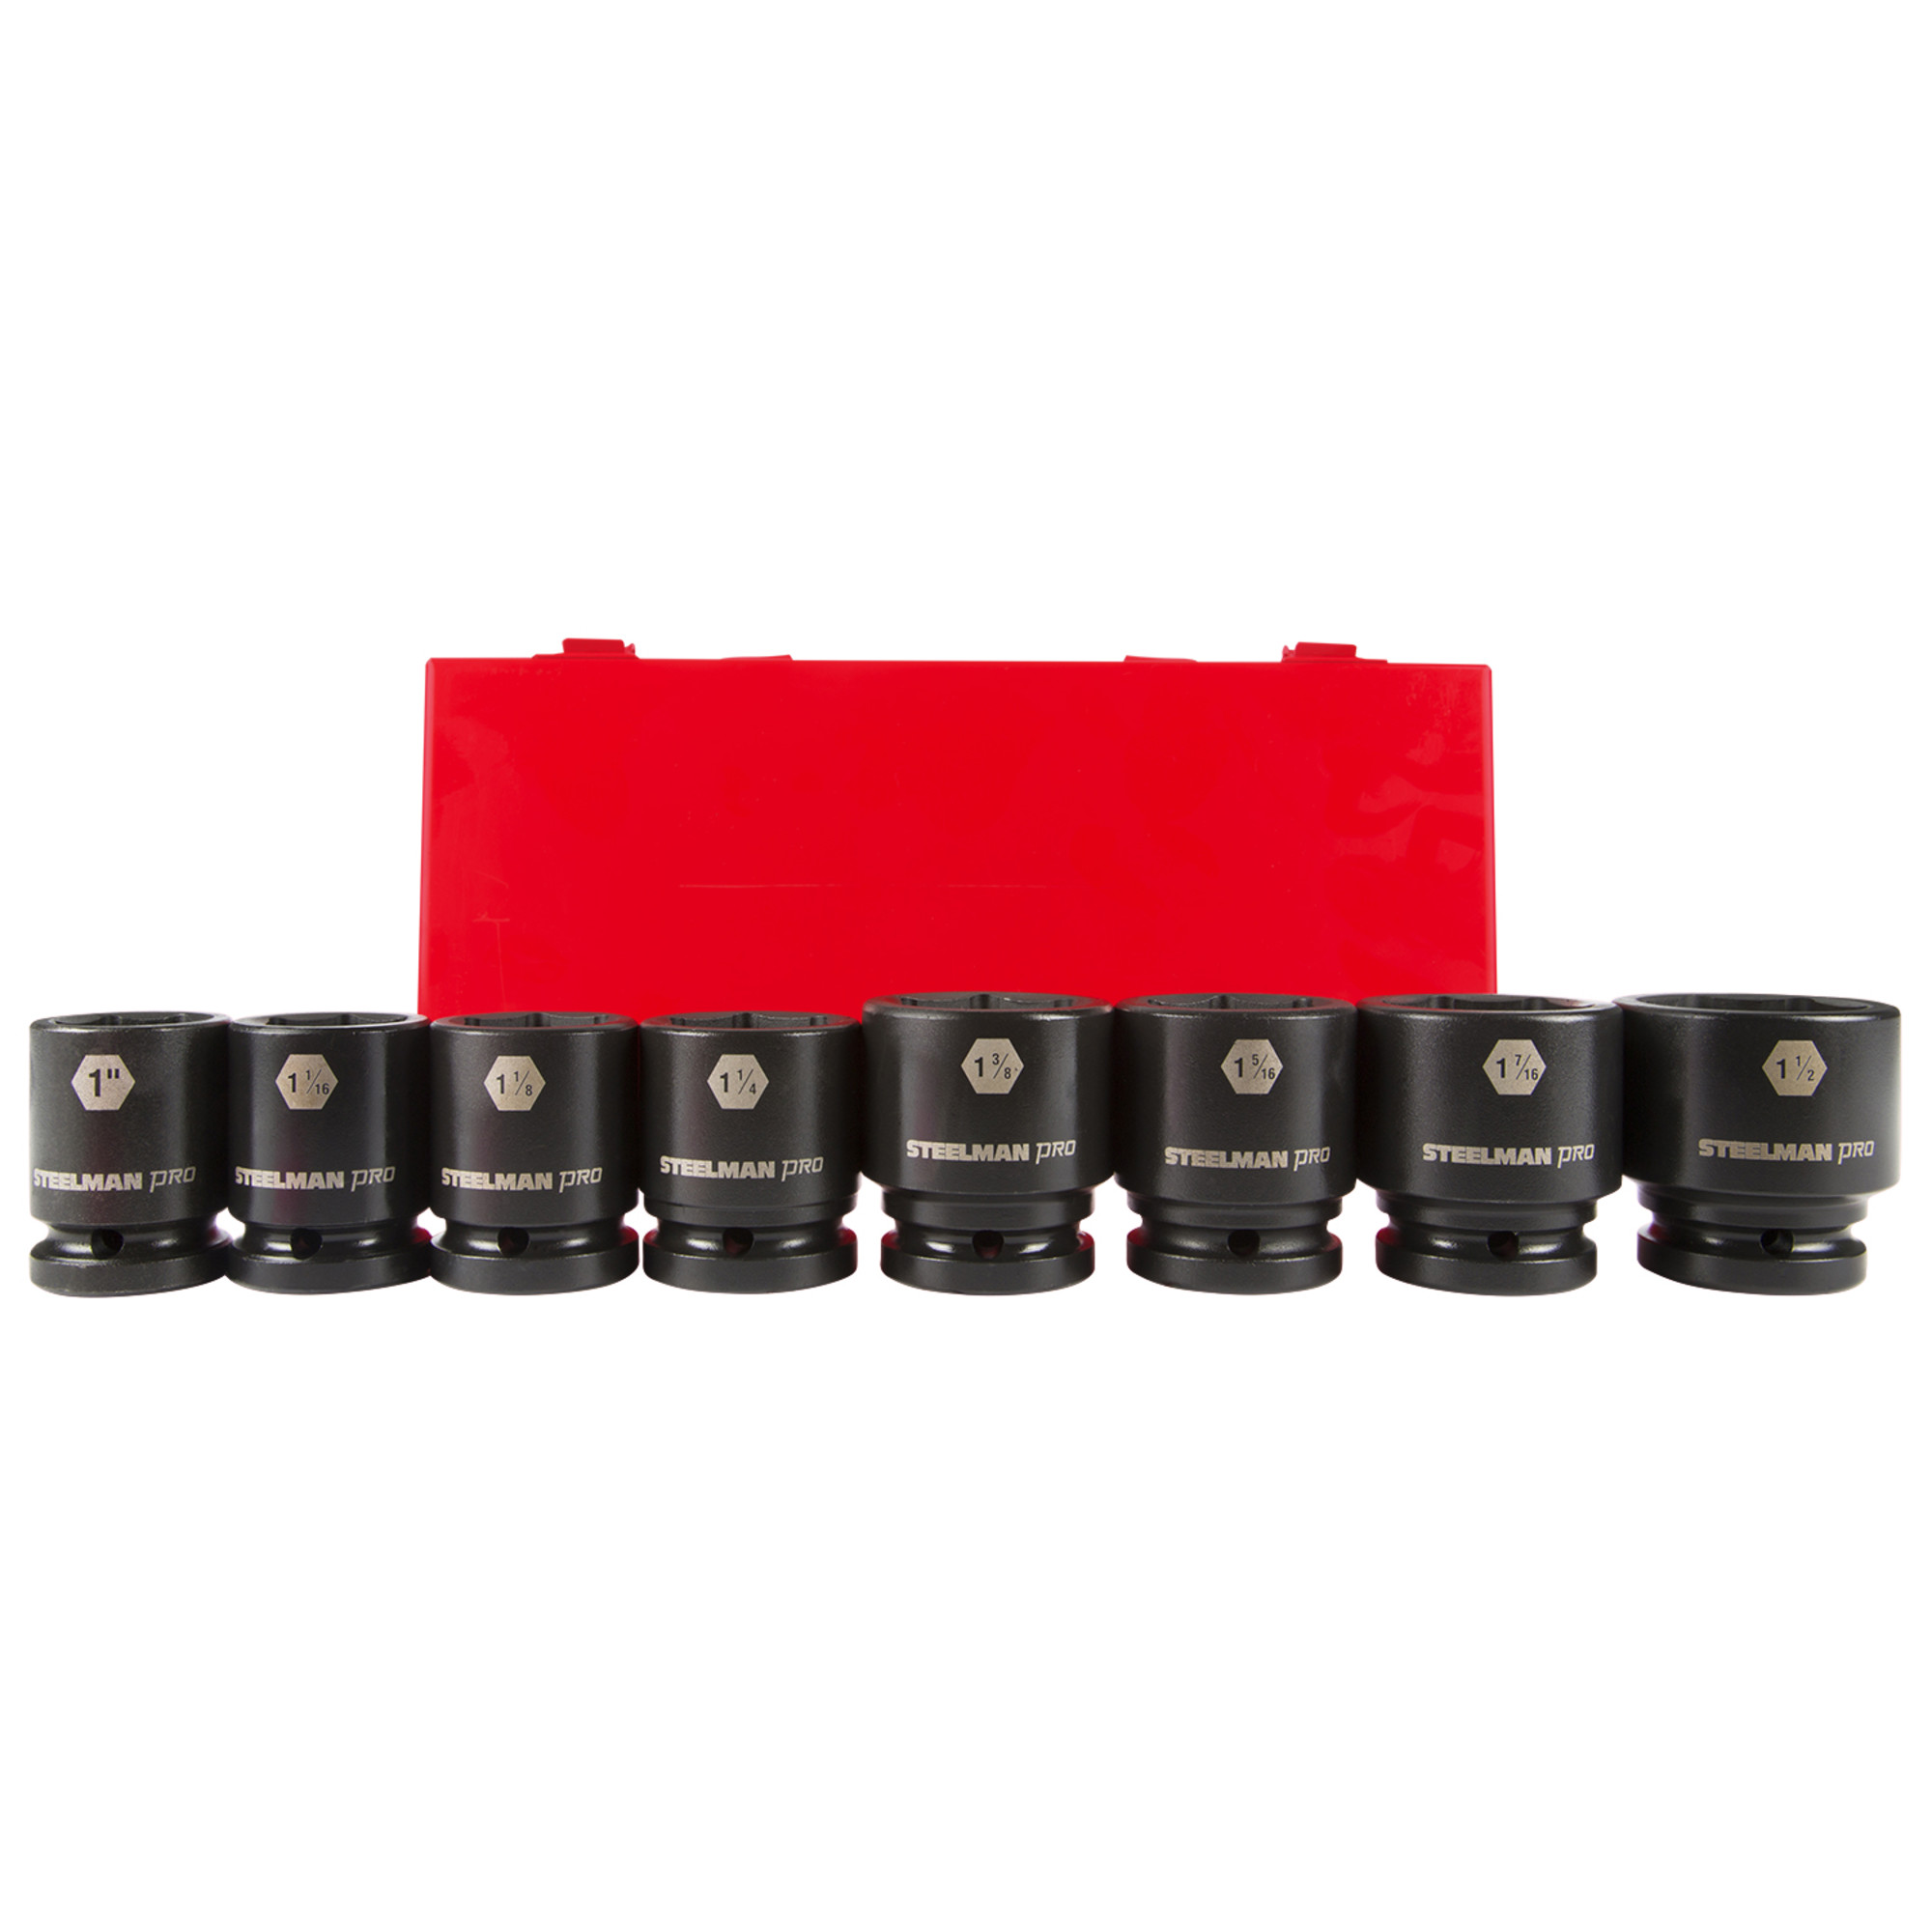 STEELMAN PRO 79318 3//4-Inch Drive x 46mm 6-Point Impact Socket